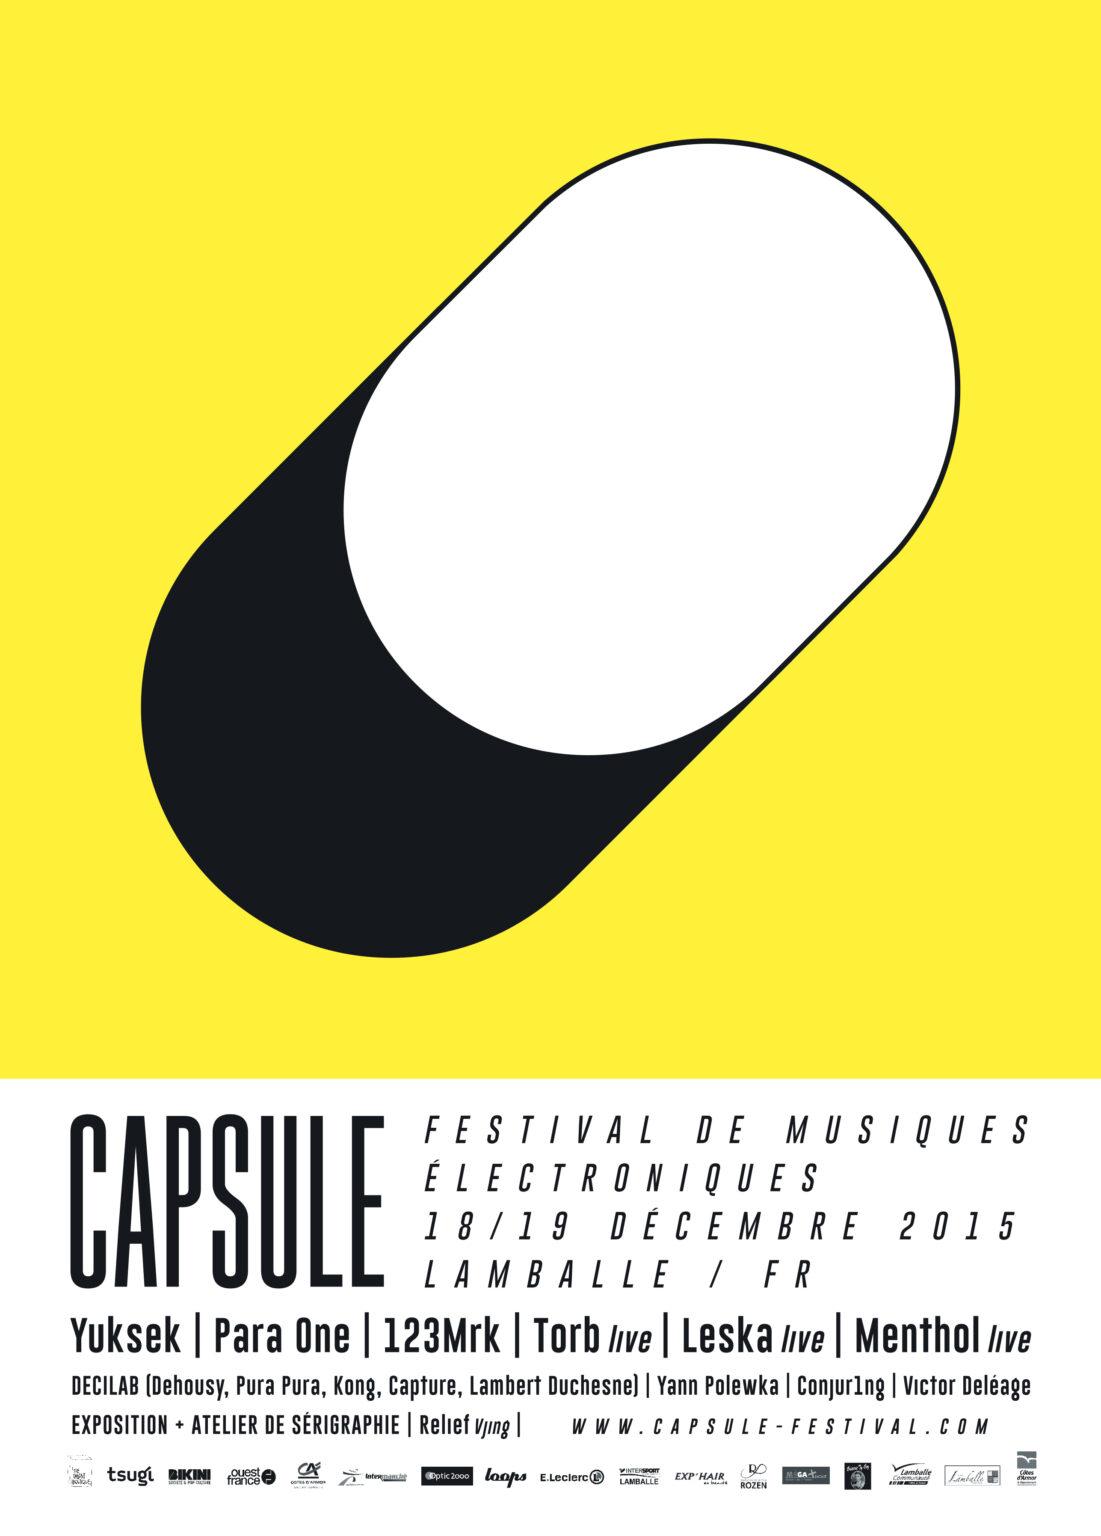 Capsule Fest. 2015 - Affiche